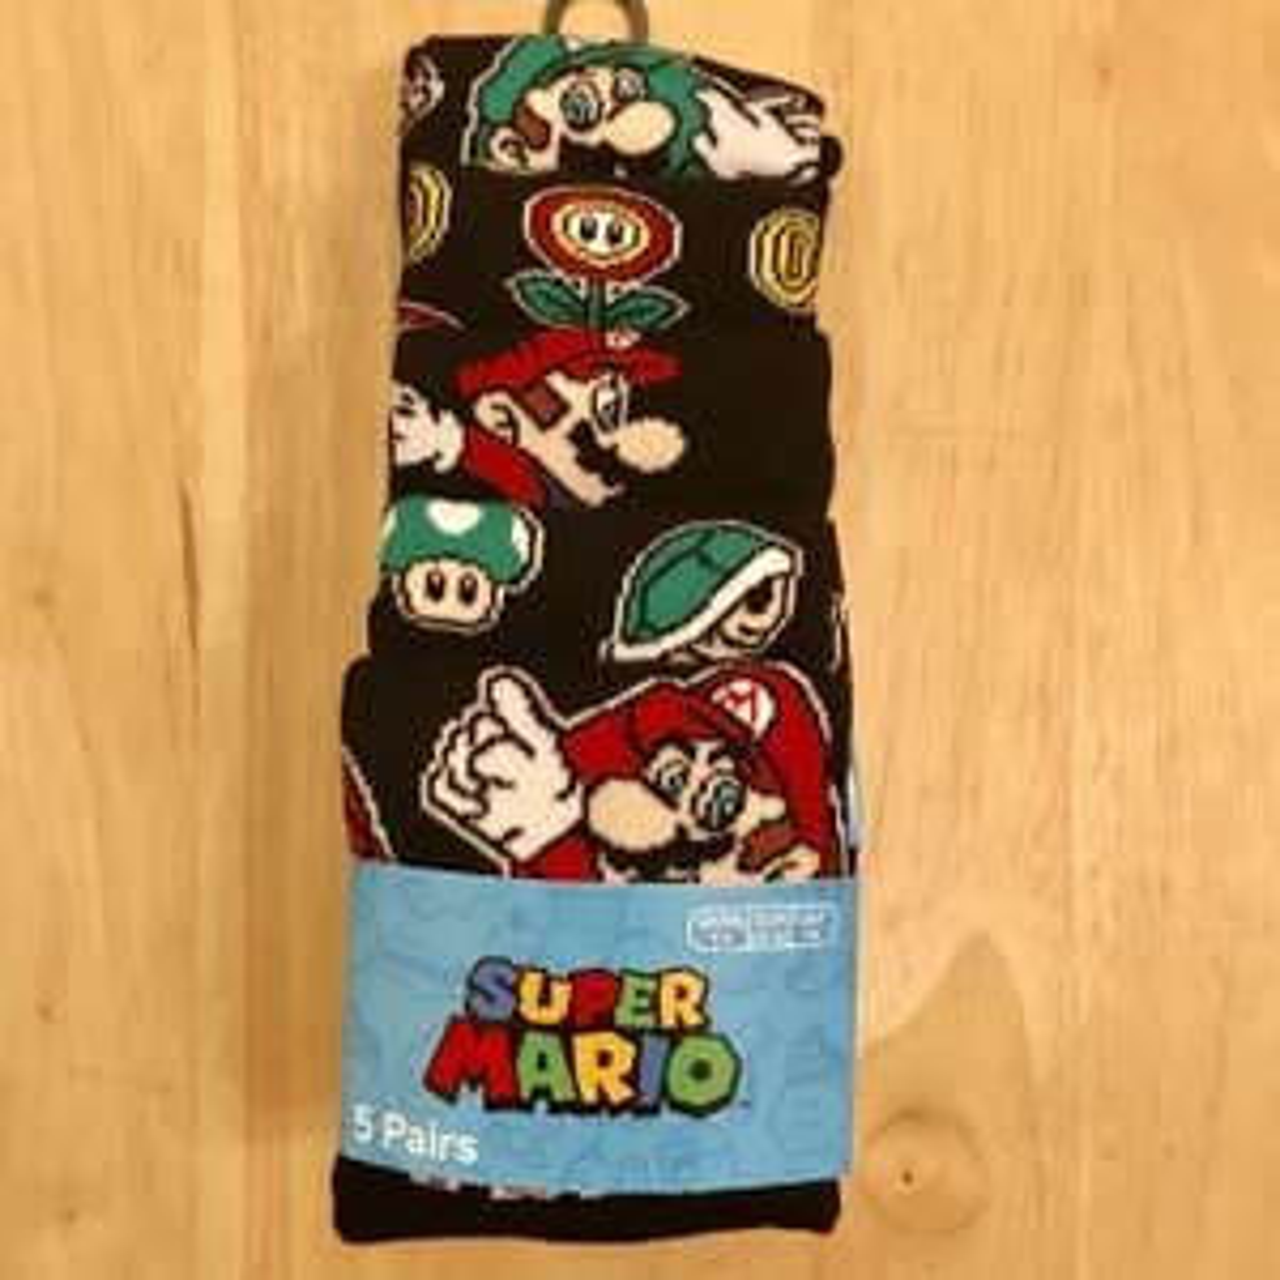 Official Nintendo Mario socks, 5 pairs for £6 Primark in store! Letsa go....